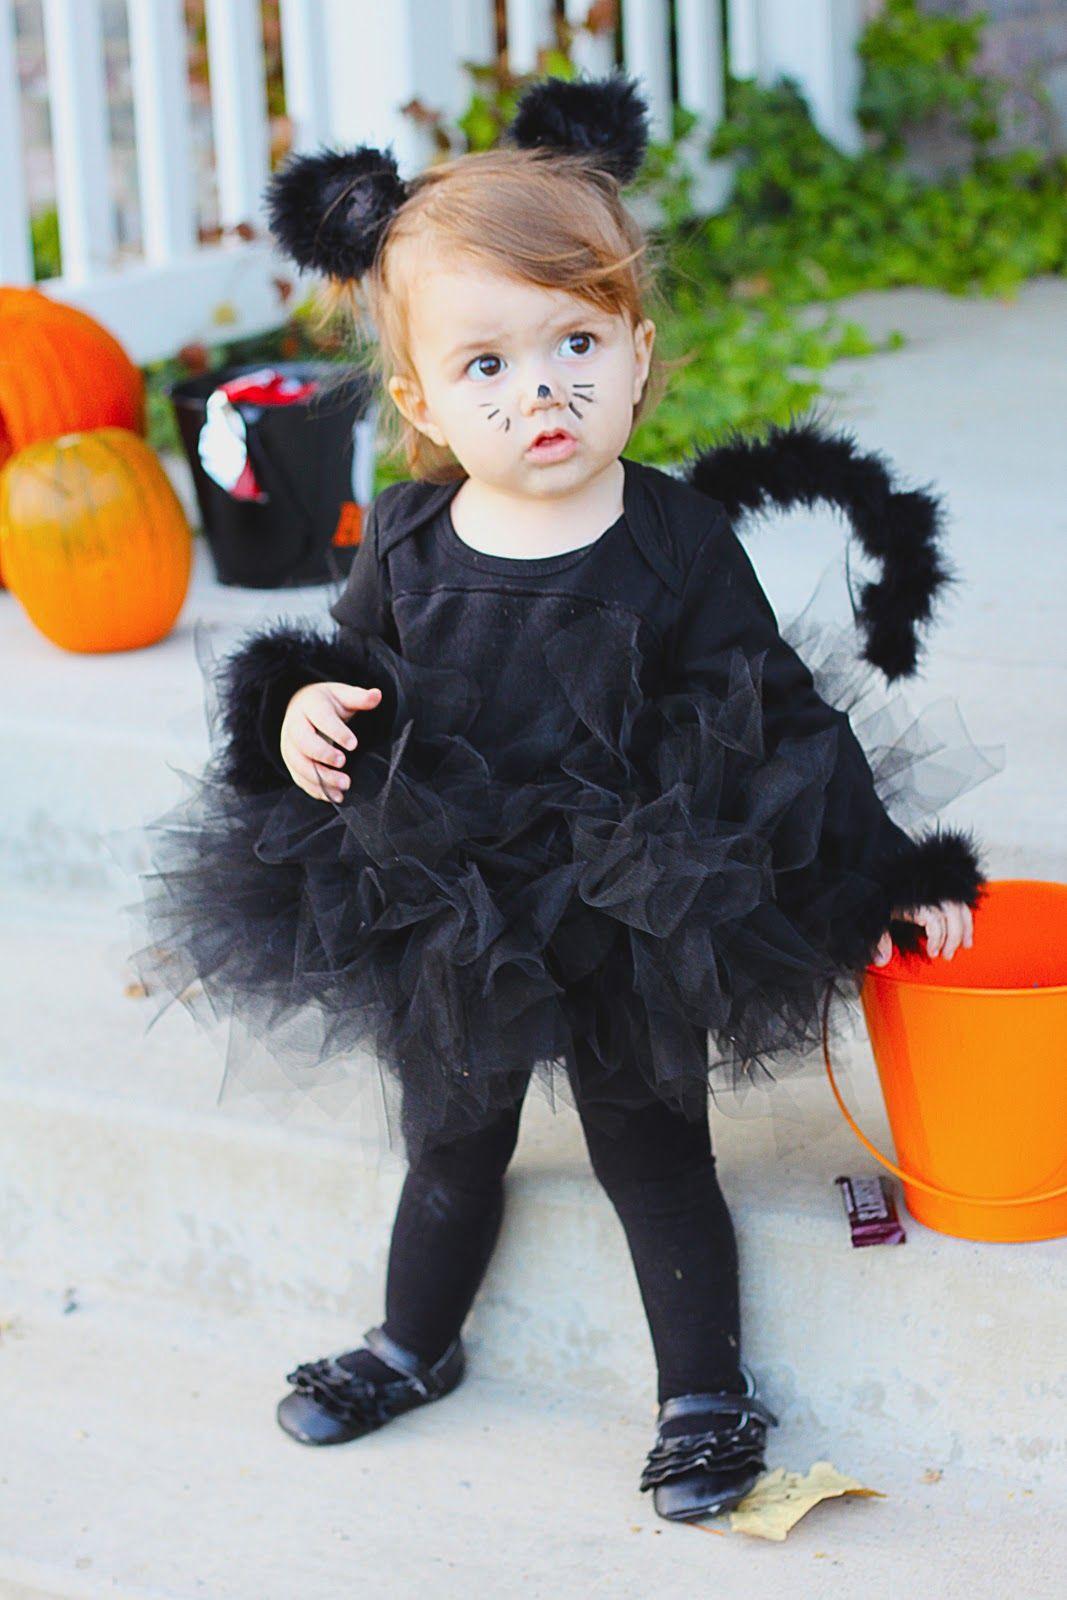 Do it yourself divas diy black cat costume im thinking lily do it yourself divas diy black cat costume im thinking lily might need to be a cat for halloween in a couple of years solutioingenieria Images